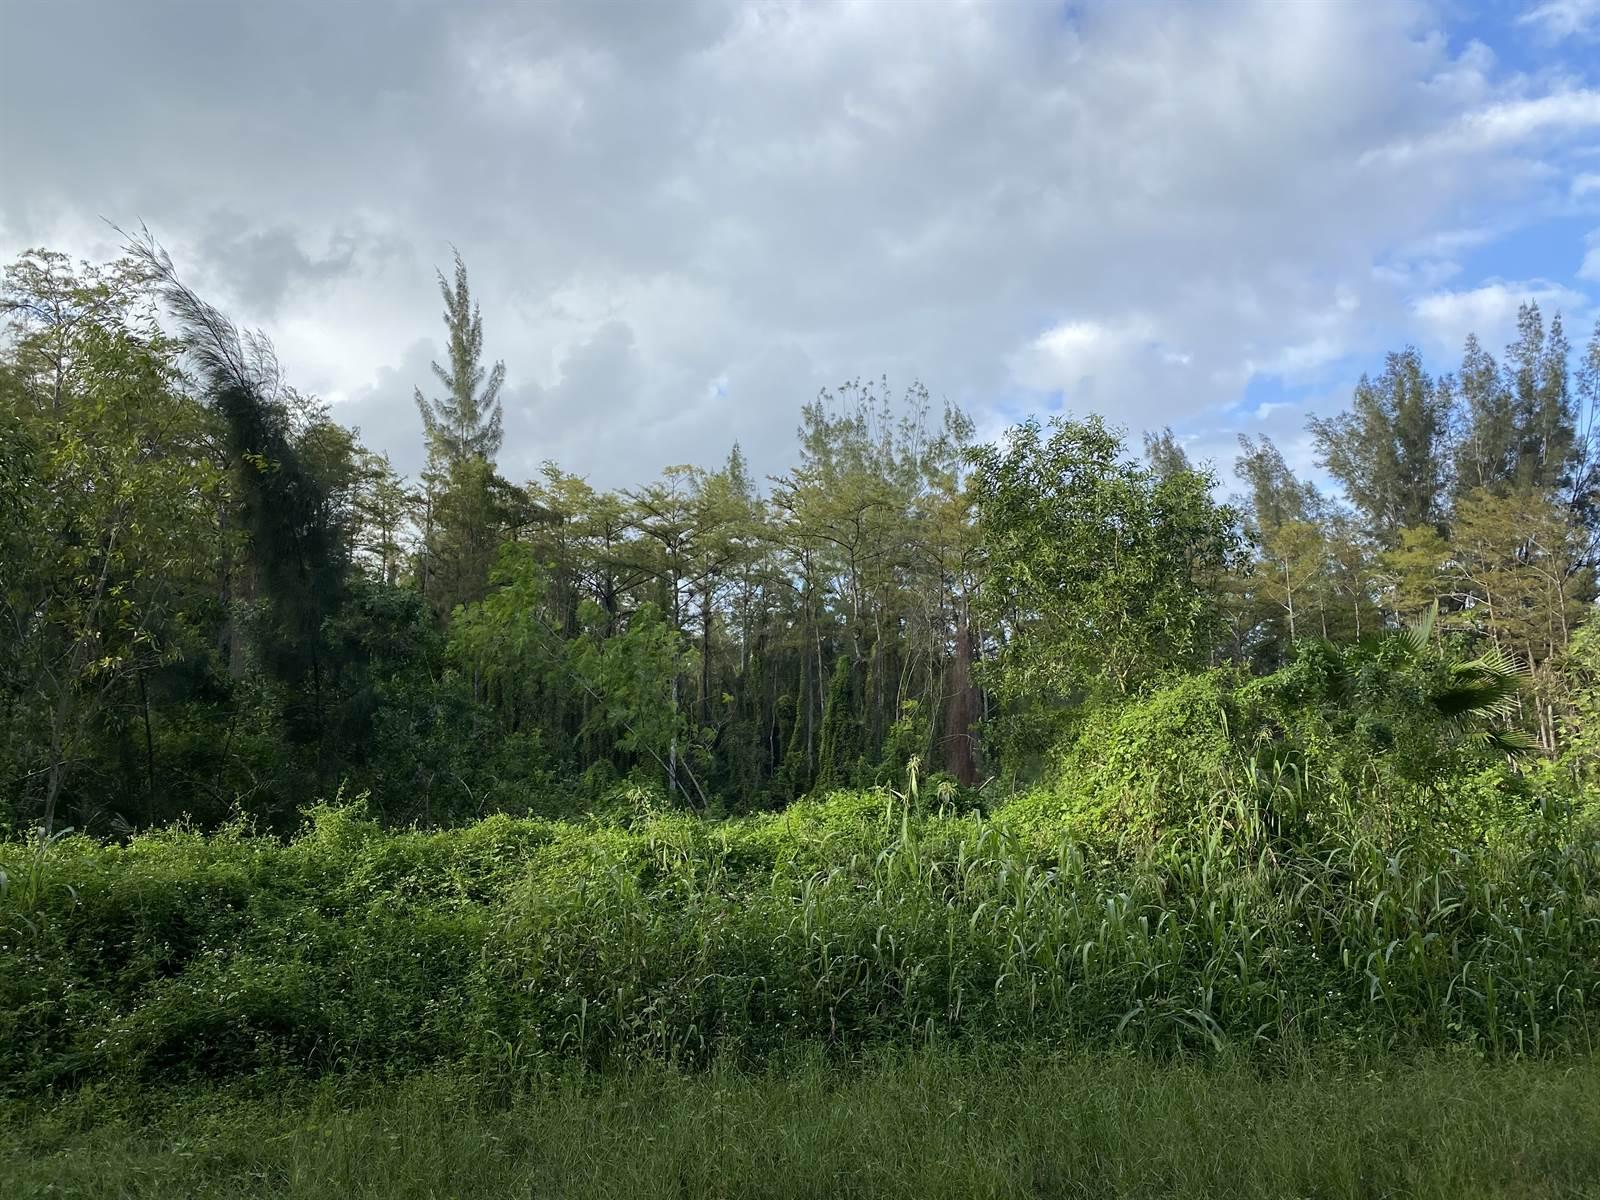 M-110 60th Street North, Loxahatchee, FL 33470